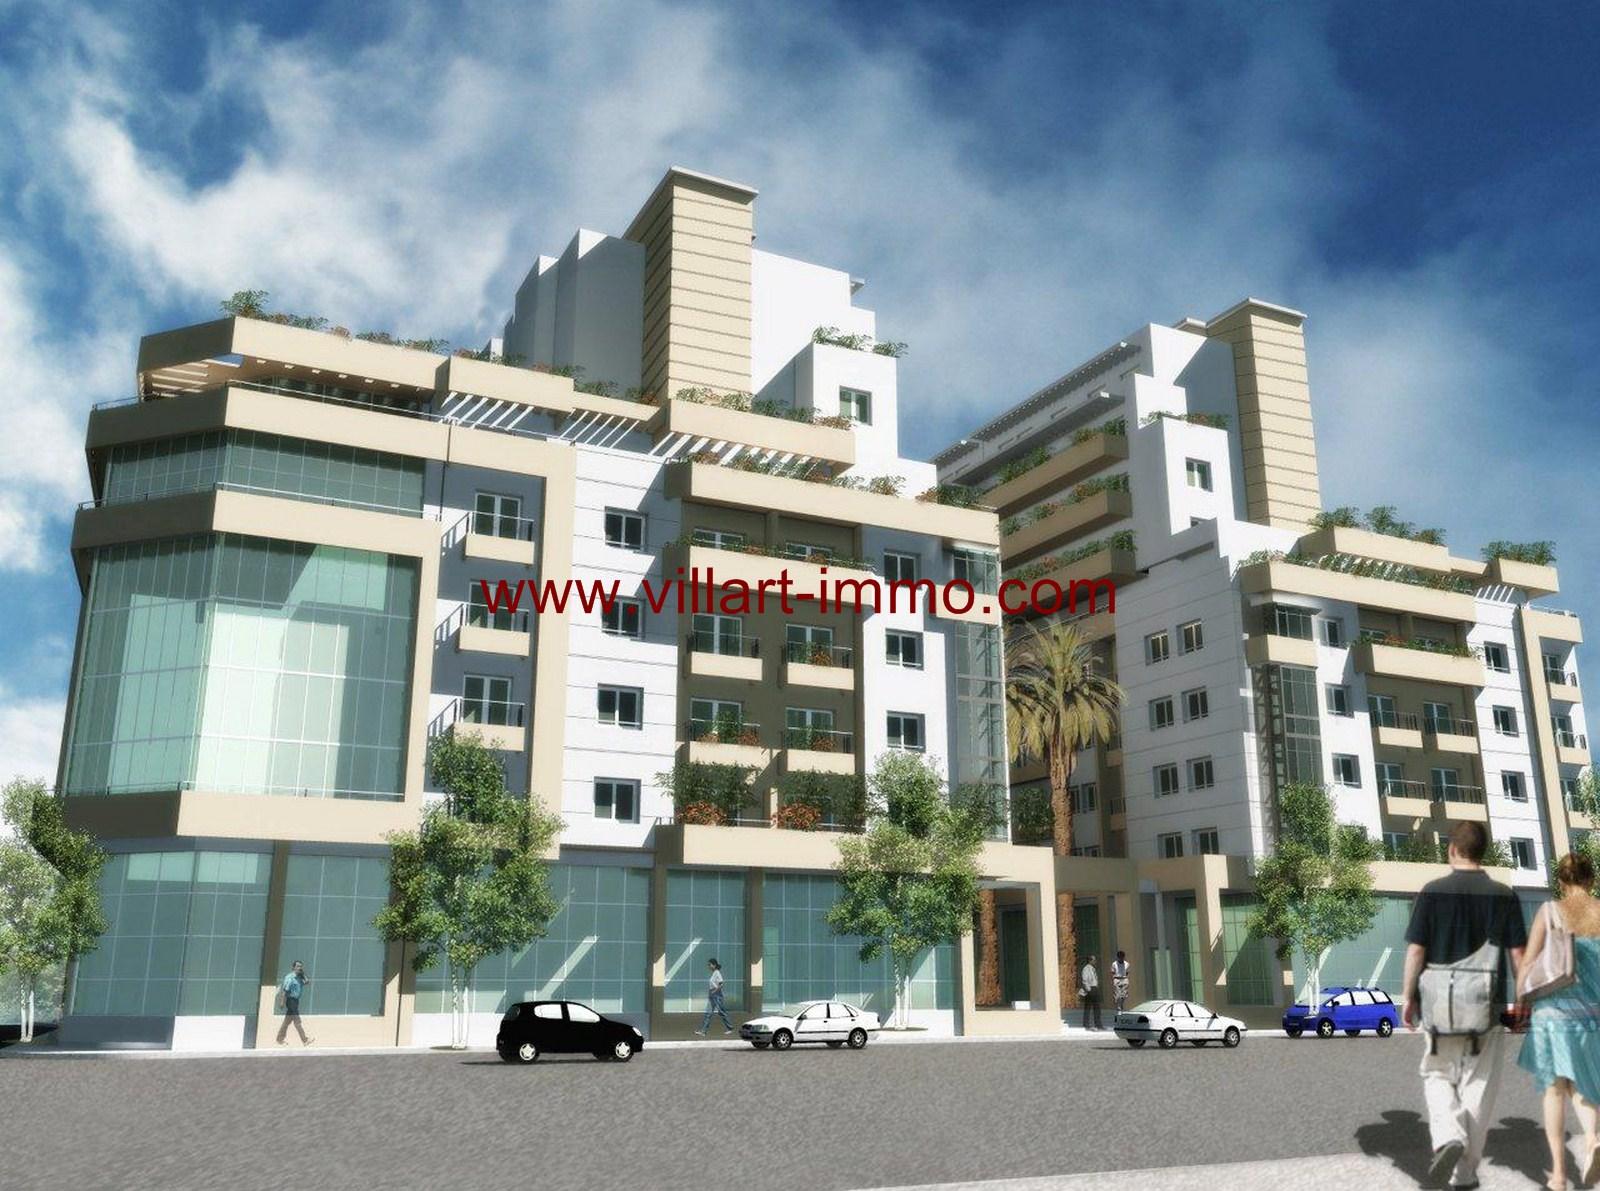 1-Vente-Appartement-Tanger-Centre-ville-SHAZ-Villart Immo